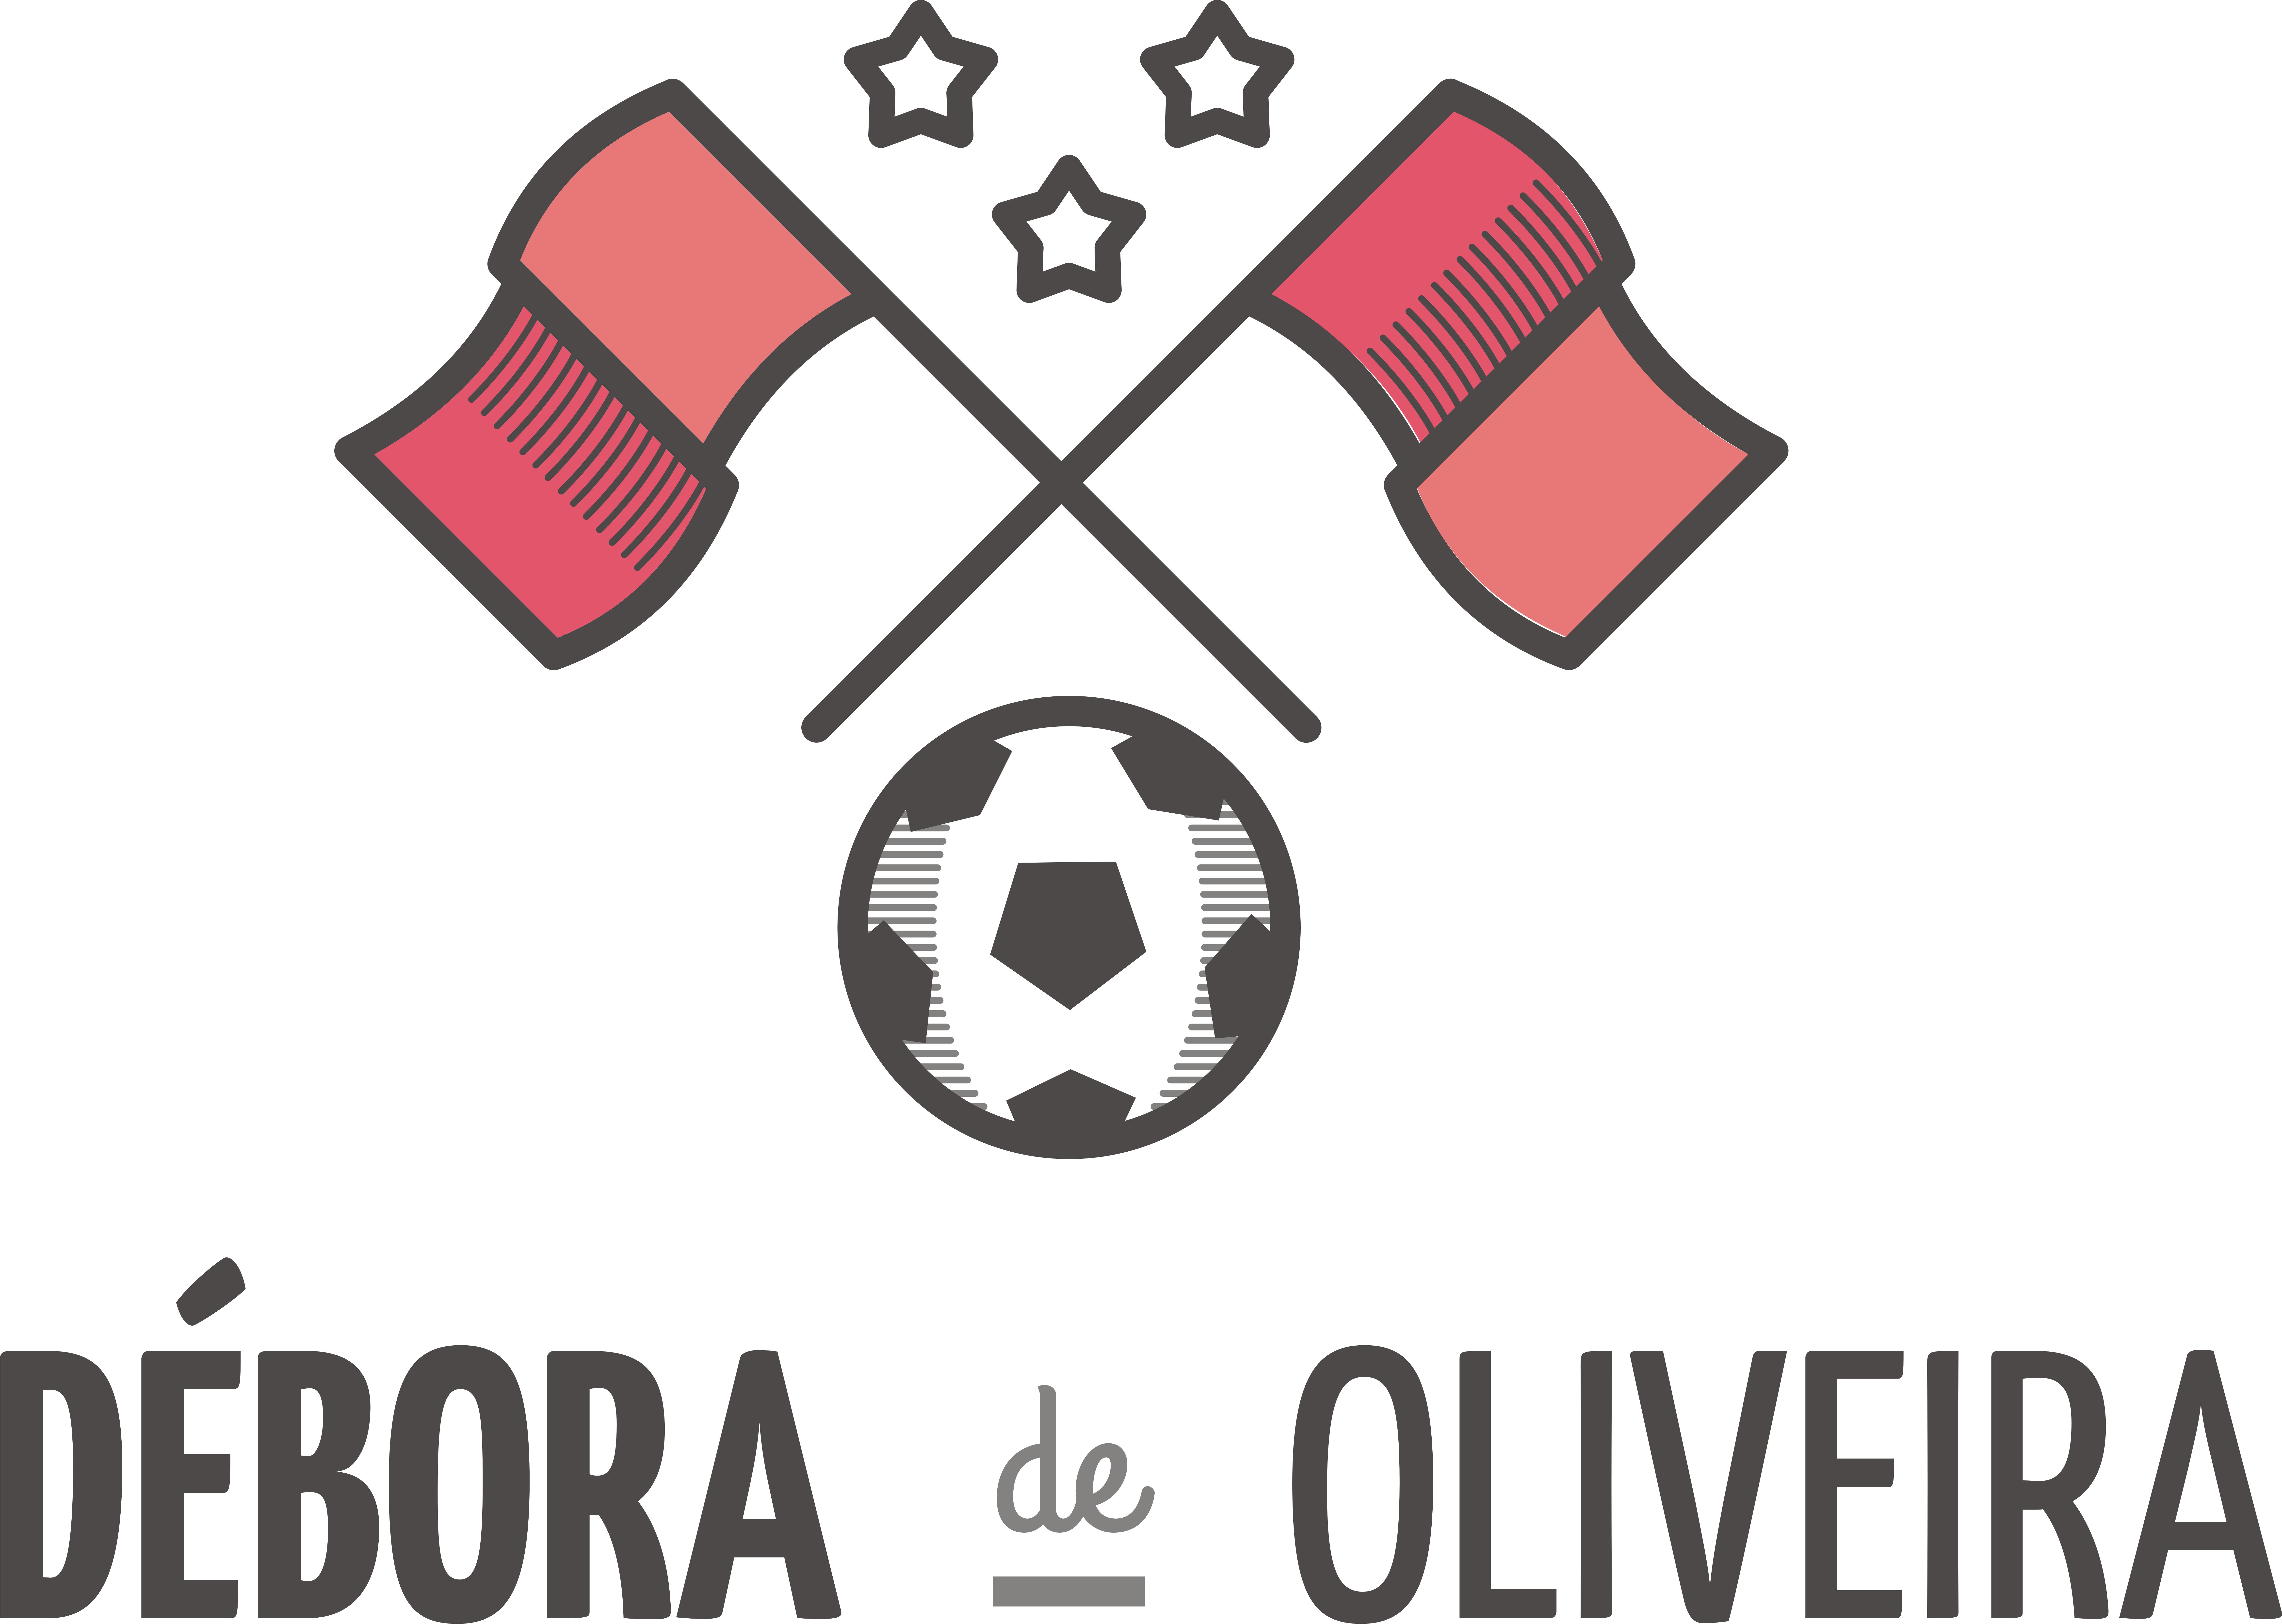 Débora de Oliveira